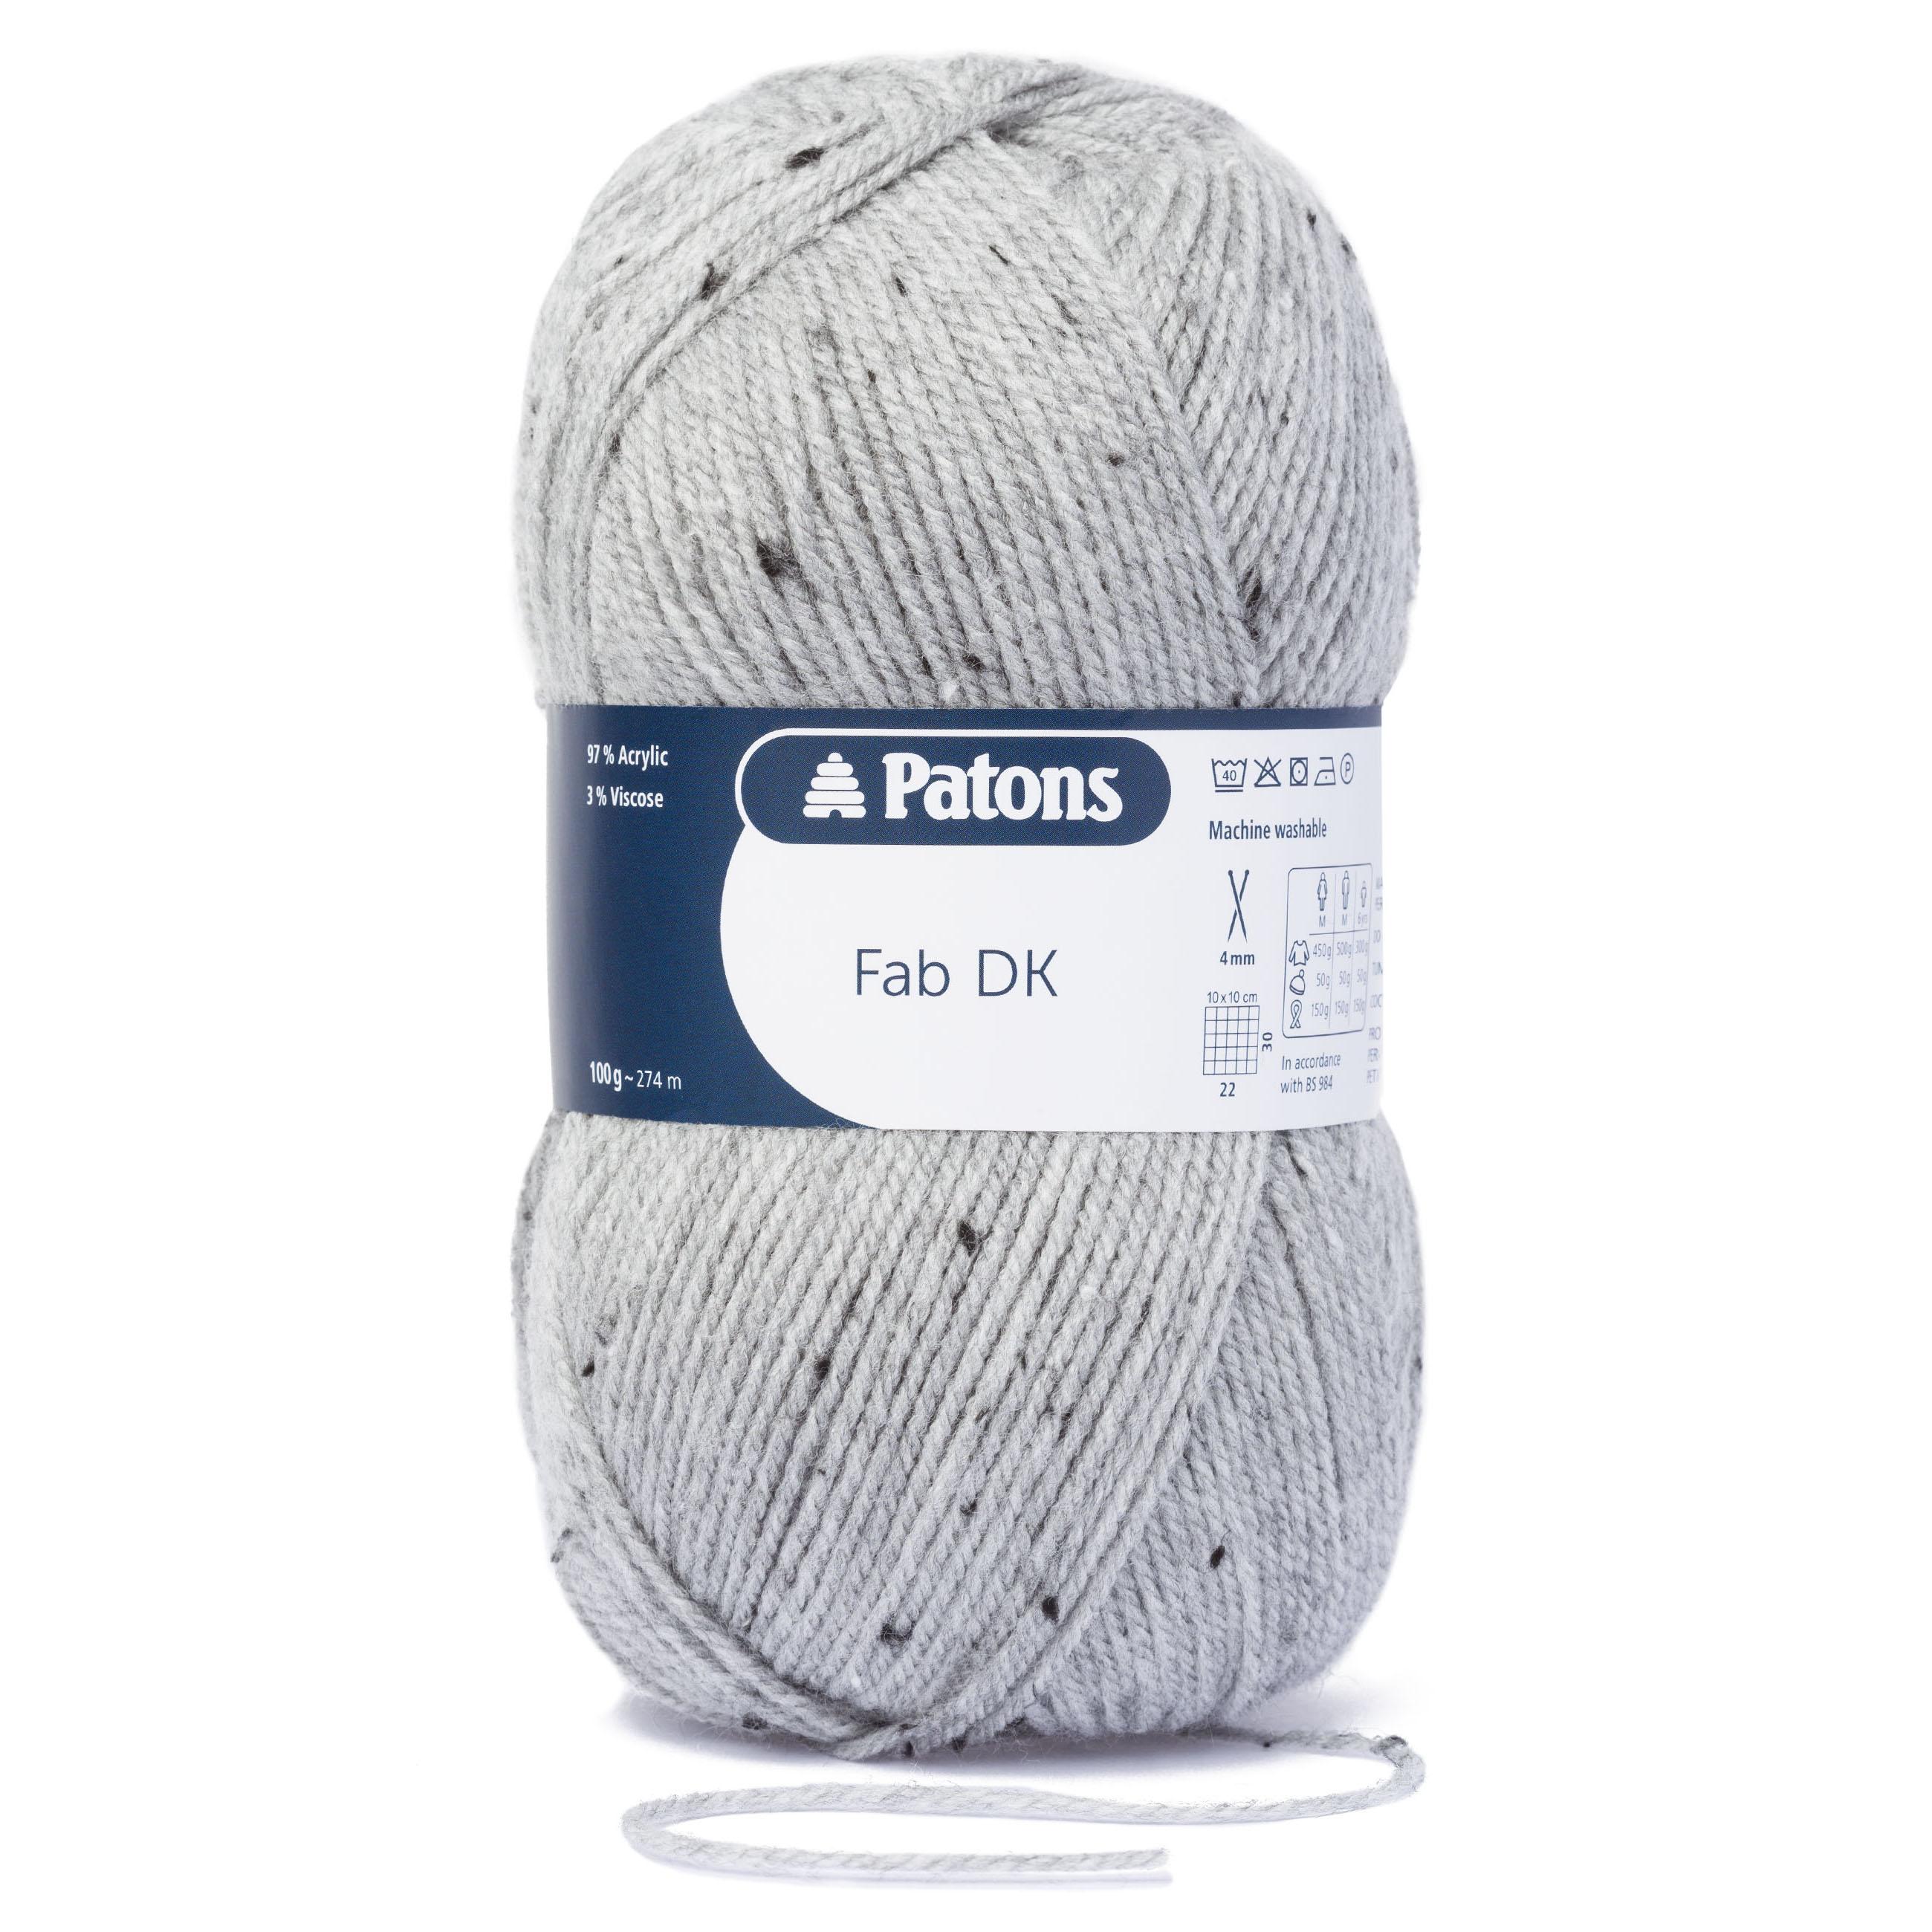 Patons FAB DK Double Knit Wool 100g - Knitting Yarn - All ...